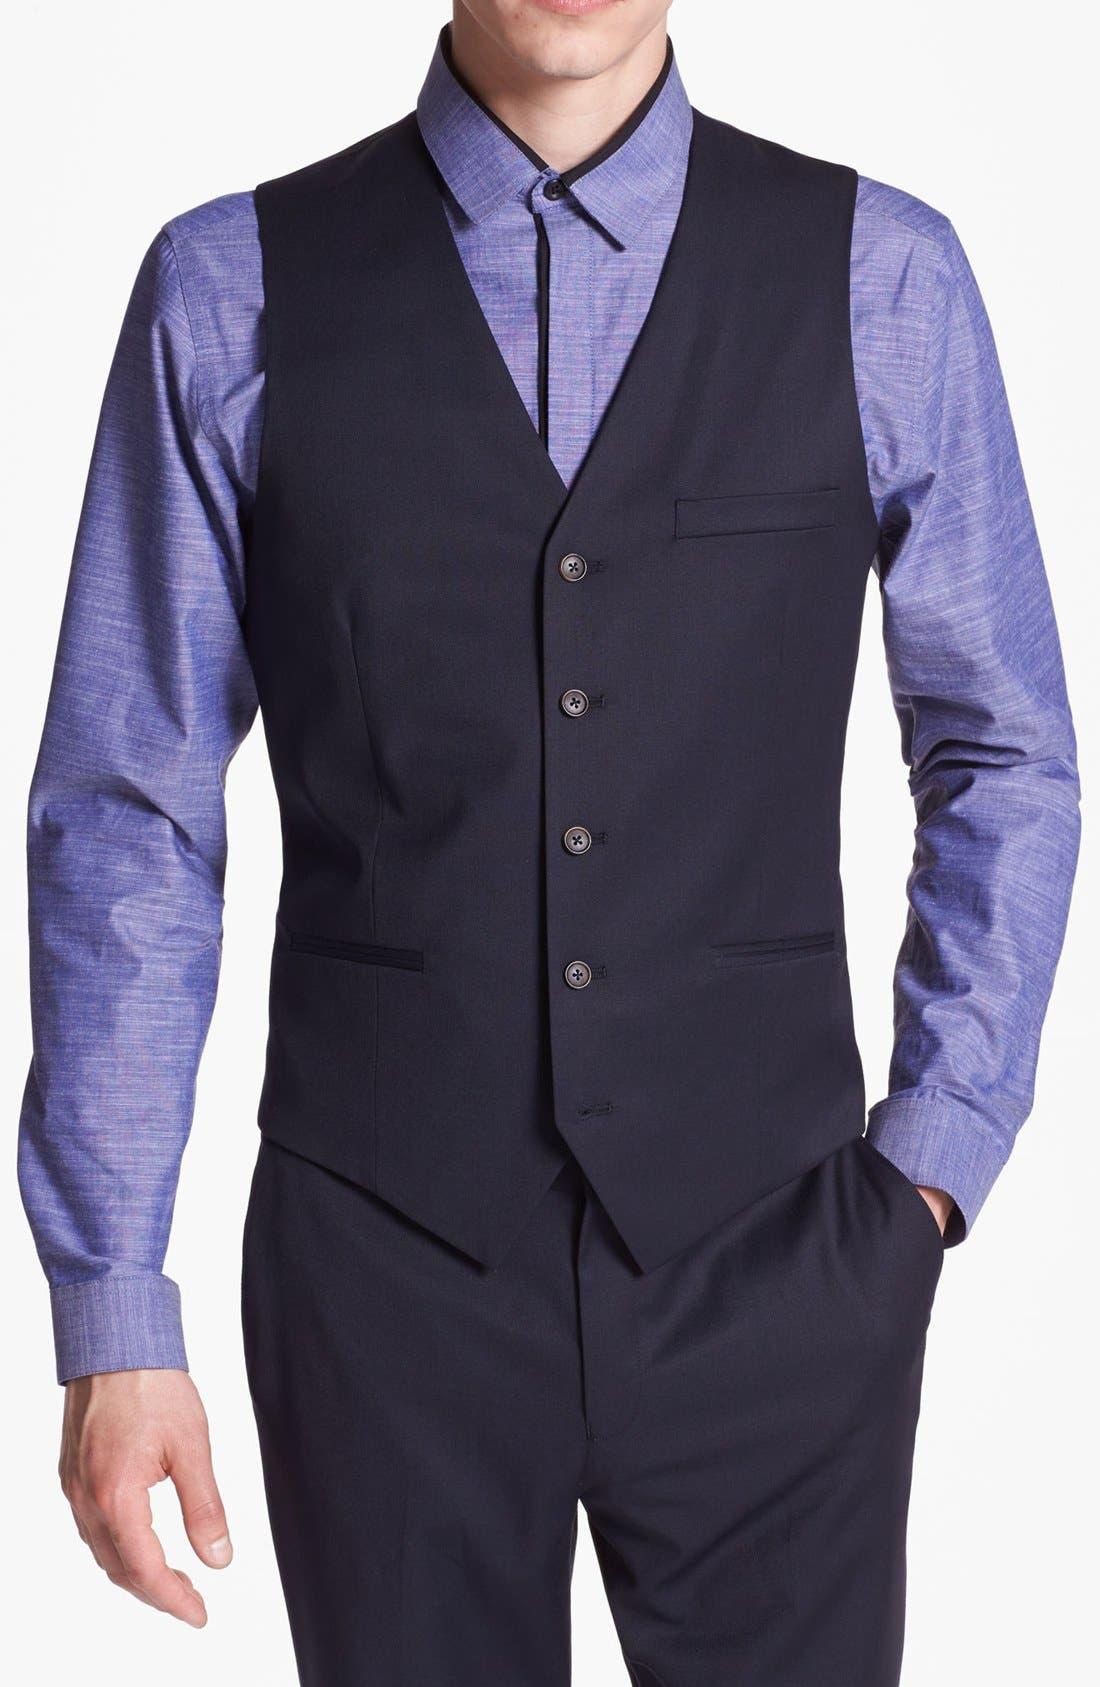 Main Image - Topman Skinny Fit Waistcoat